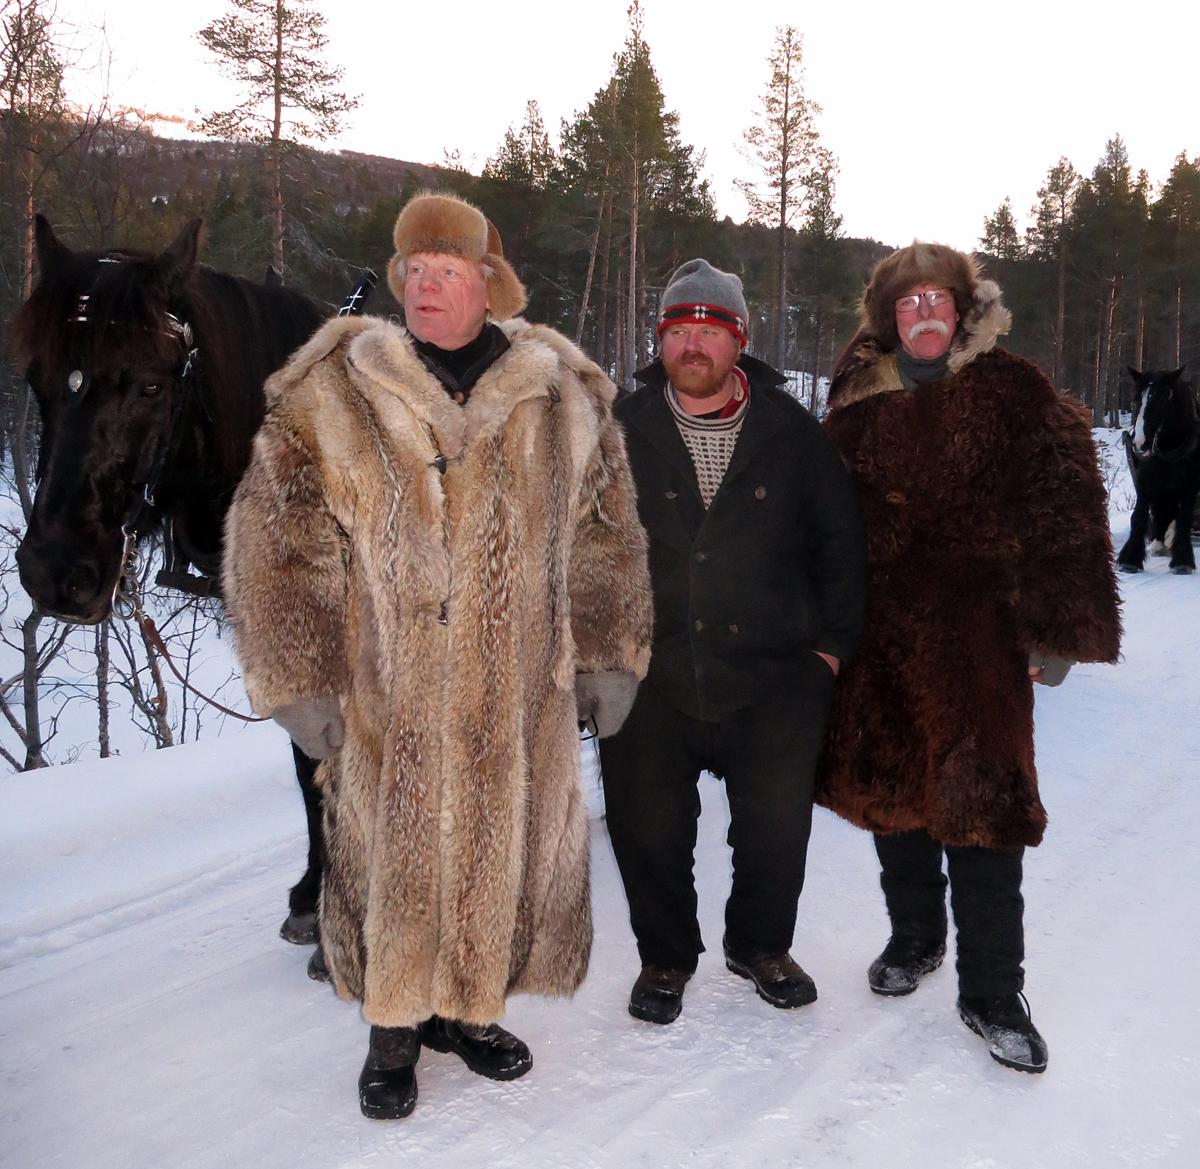 Tre ulike typer klær som holder kulda ute; pels, vadmel (vømmøl) og saumudd (t.h.) med trolig hundepels rundt kragen. Foto: Karine Bogsti